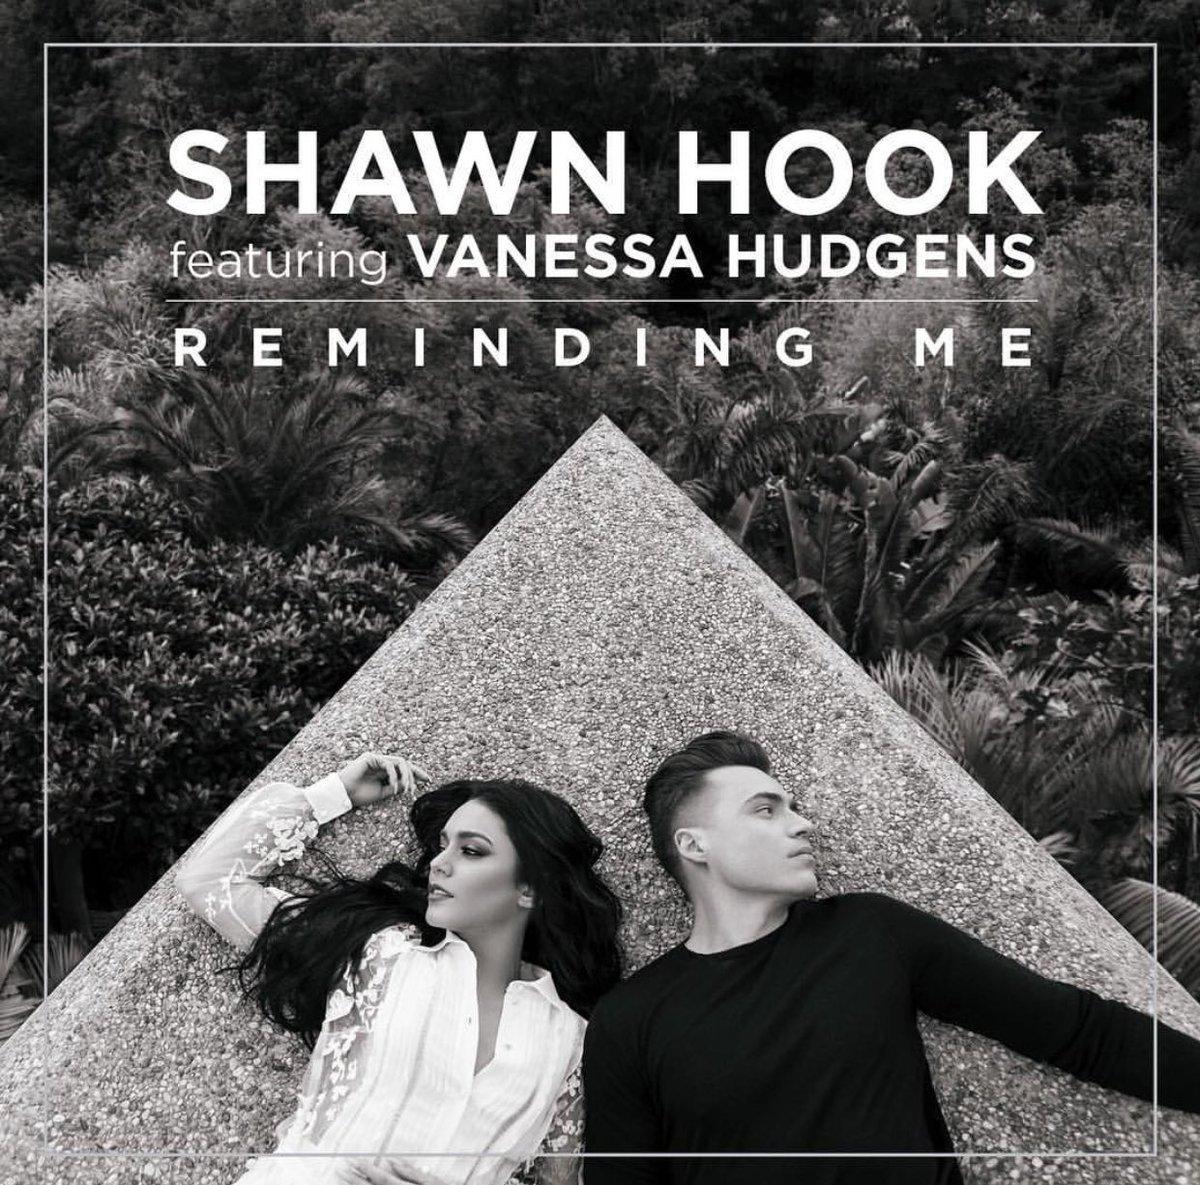 .@ShawnHook ft @VanessaHudgens #RemindingMe is your #7 song on #ShazamAt7 tonight! @Shazam LISTEN LIVE:  http:// bit.ly/KiSS925Player  &nbsp;  <br>http://pic.twitter.com/z1mdkYV4hN